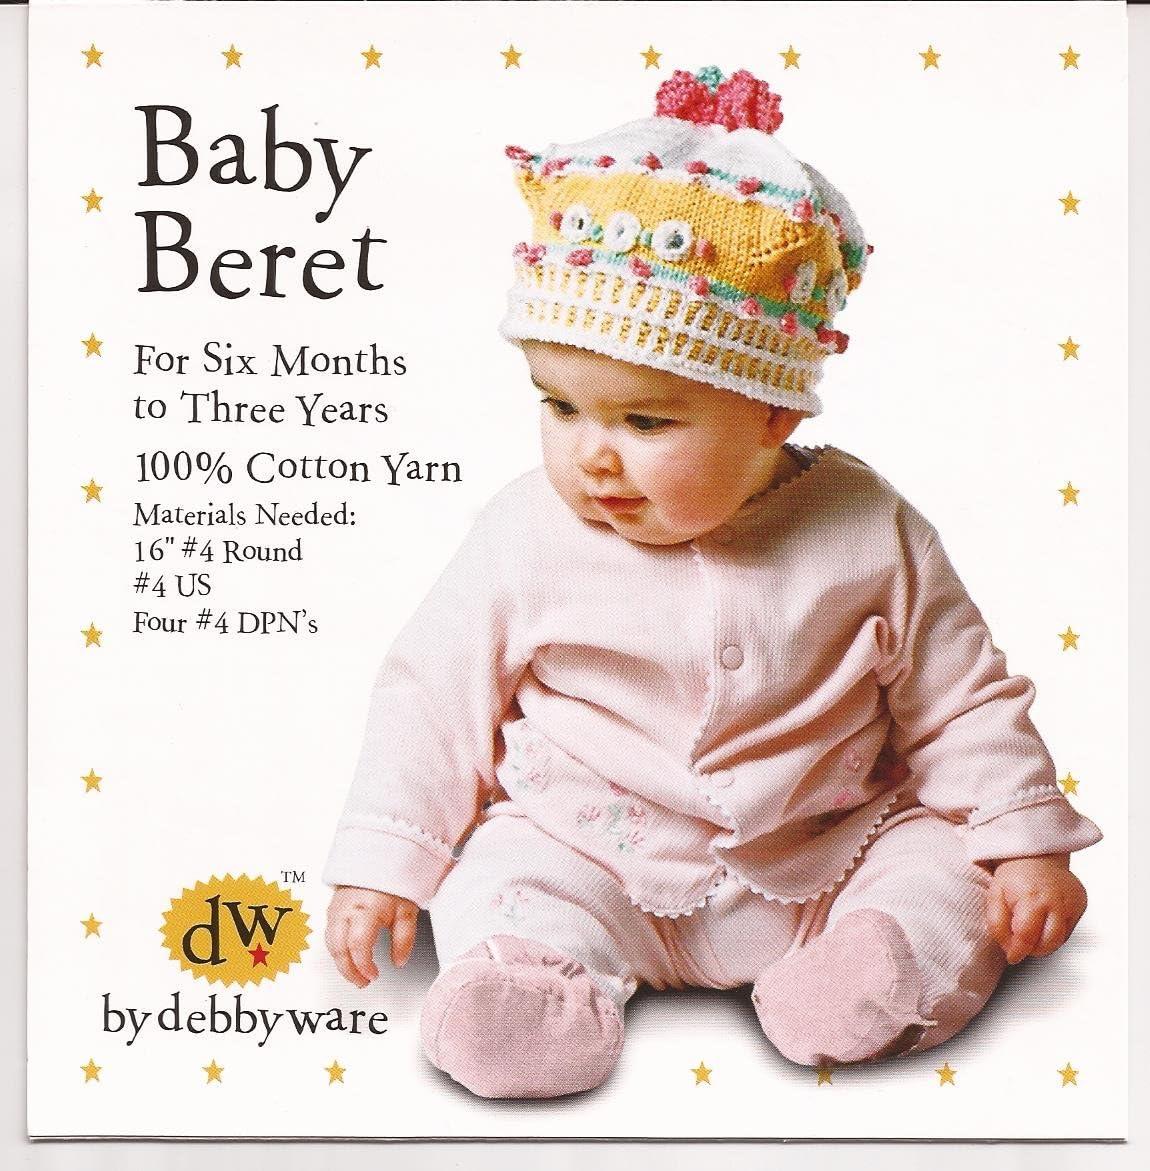 Debby Ware Knitting Pattern Baby Beret